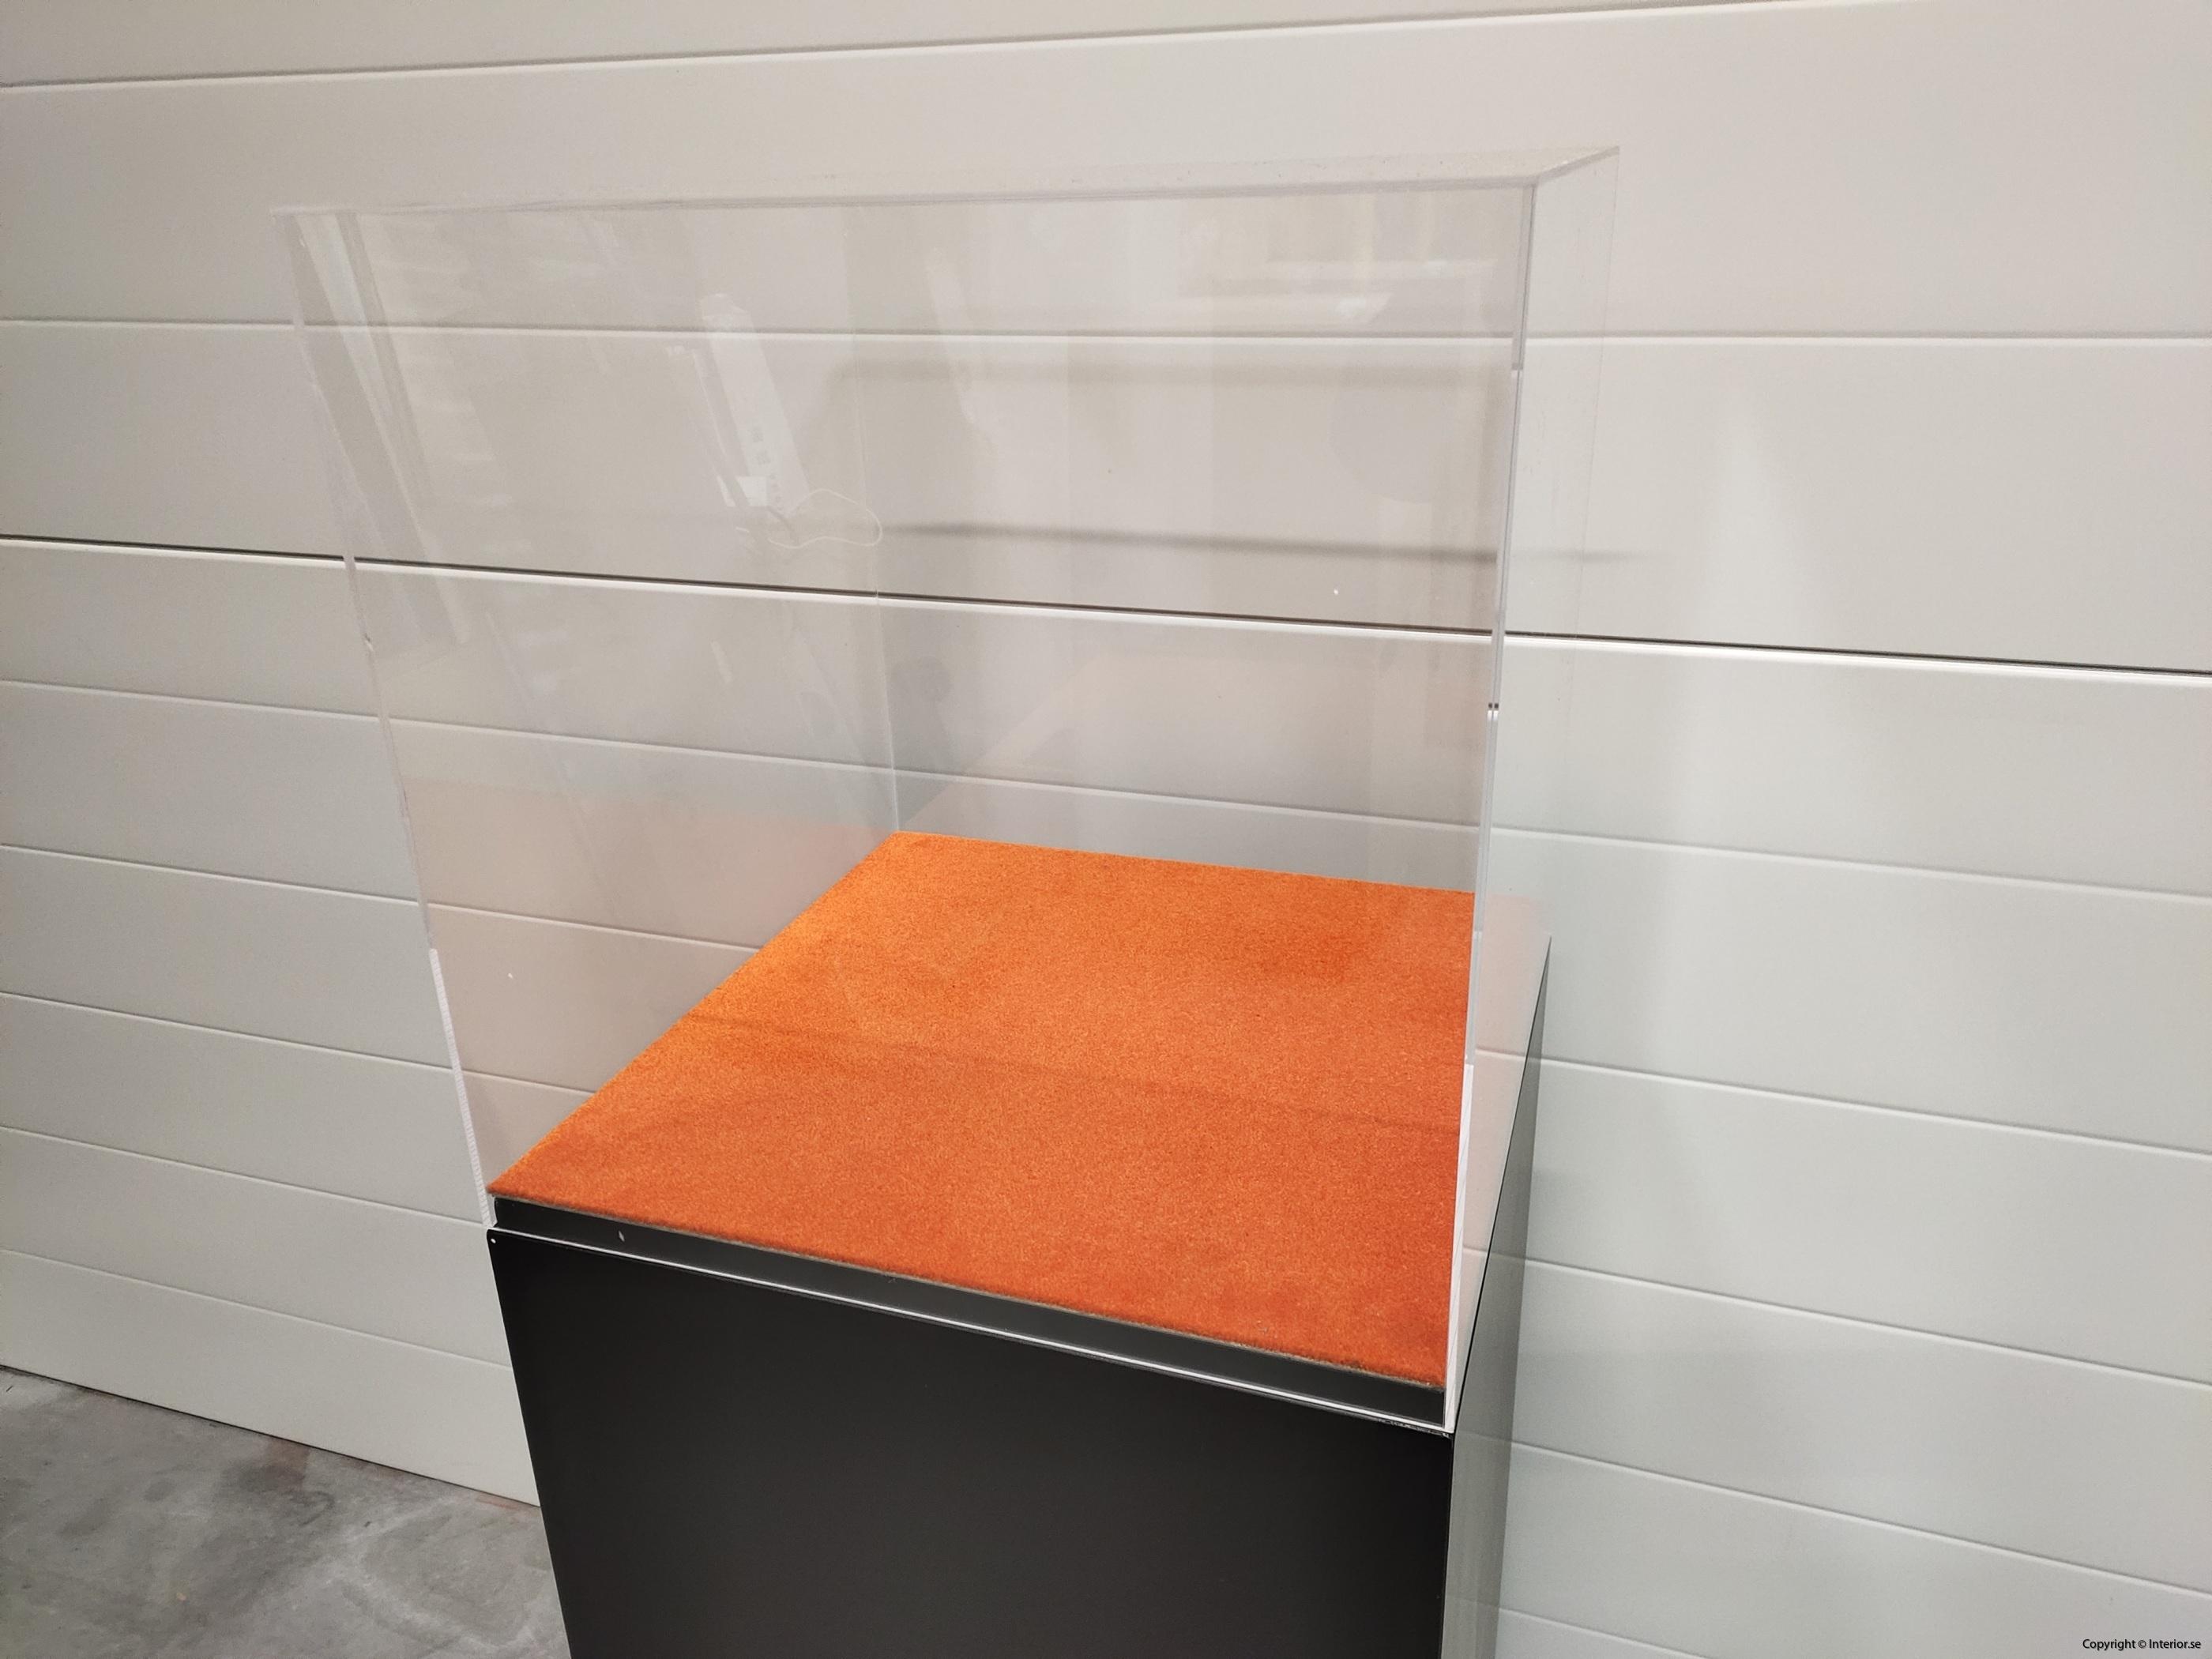 Utställningsmonter  Piedestal - 152 cm hyra monter stockholm (9)